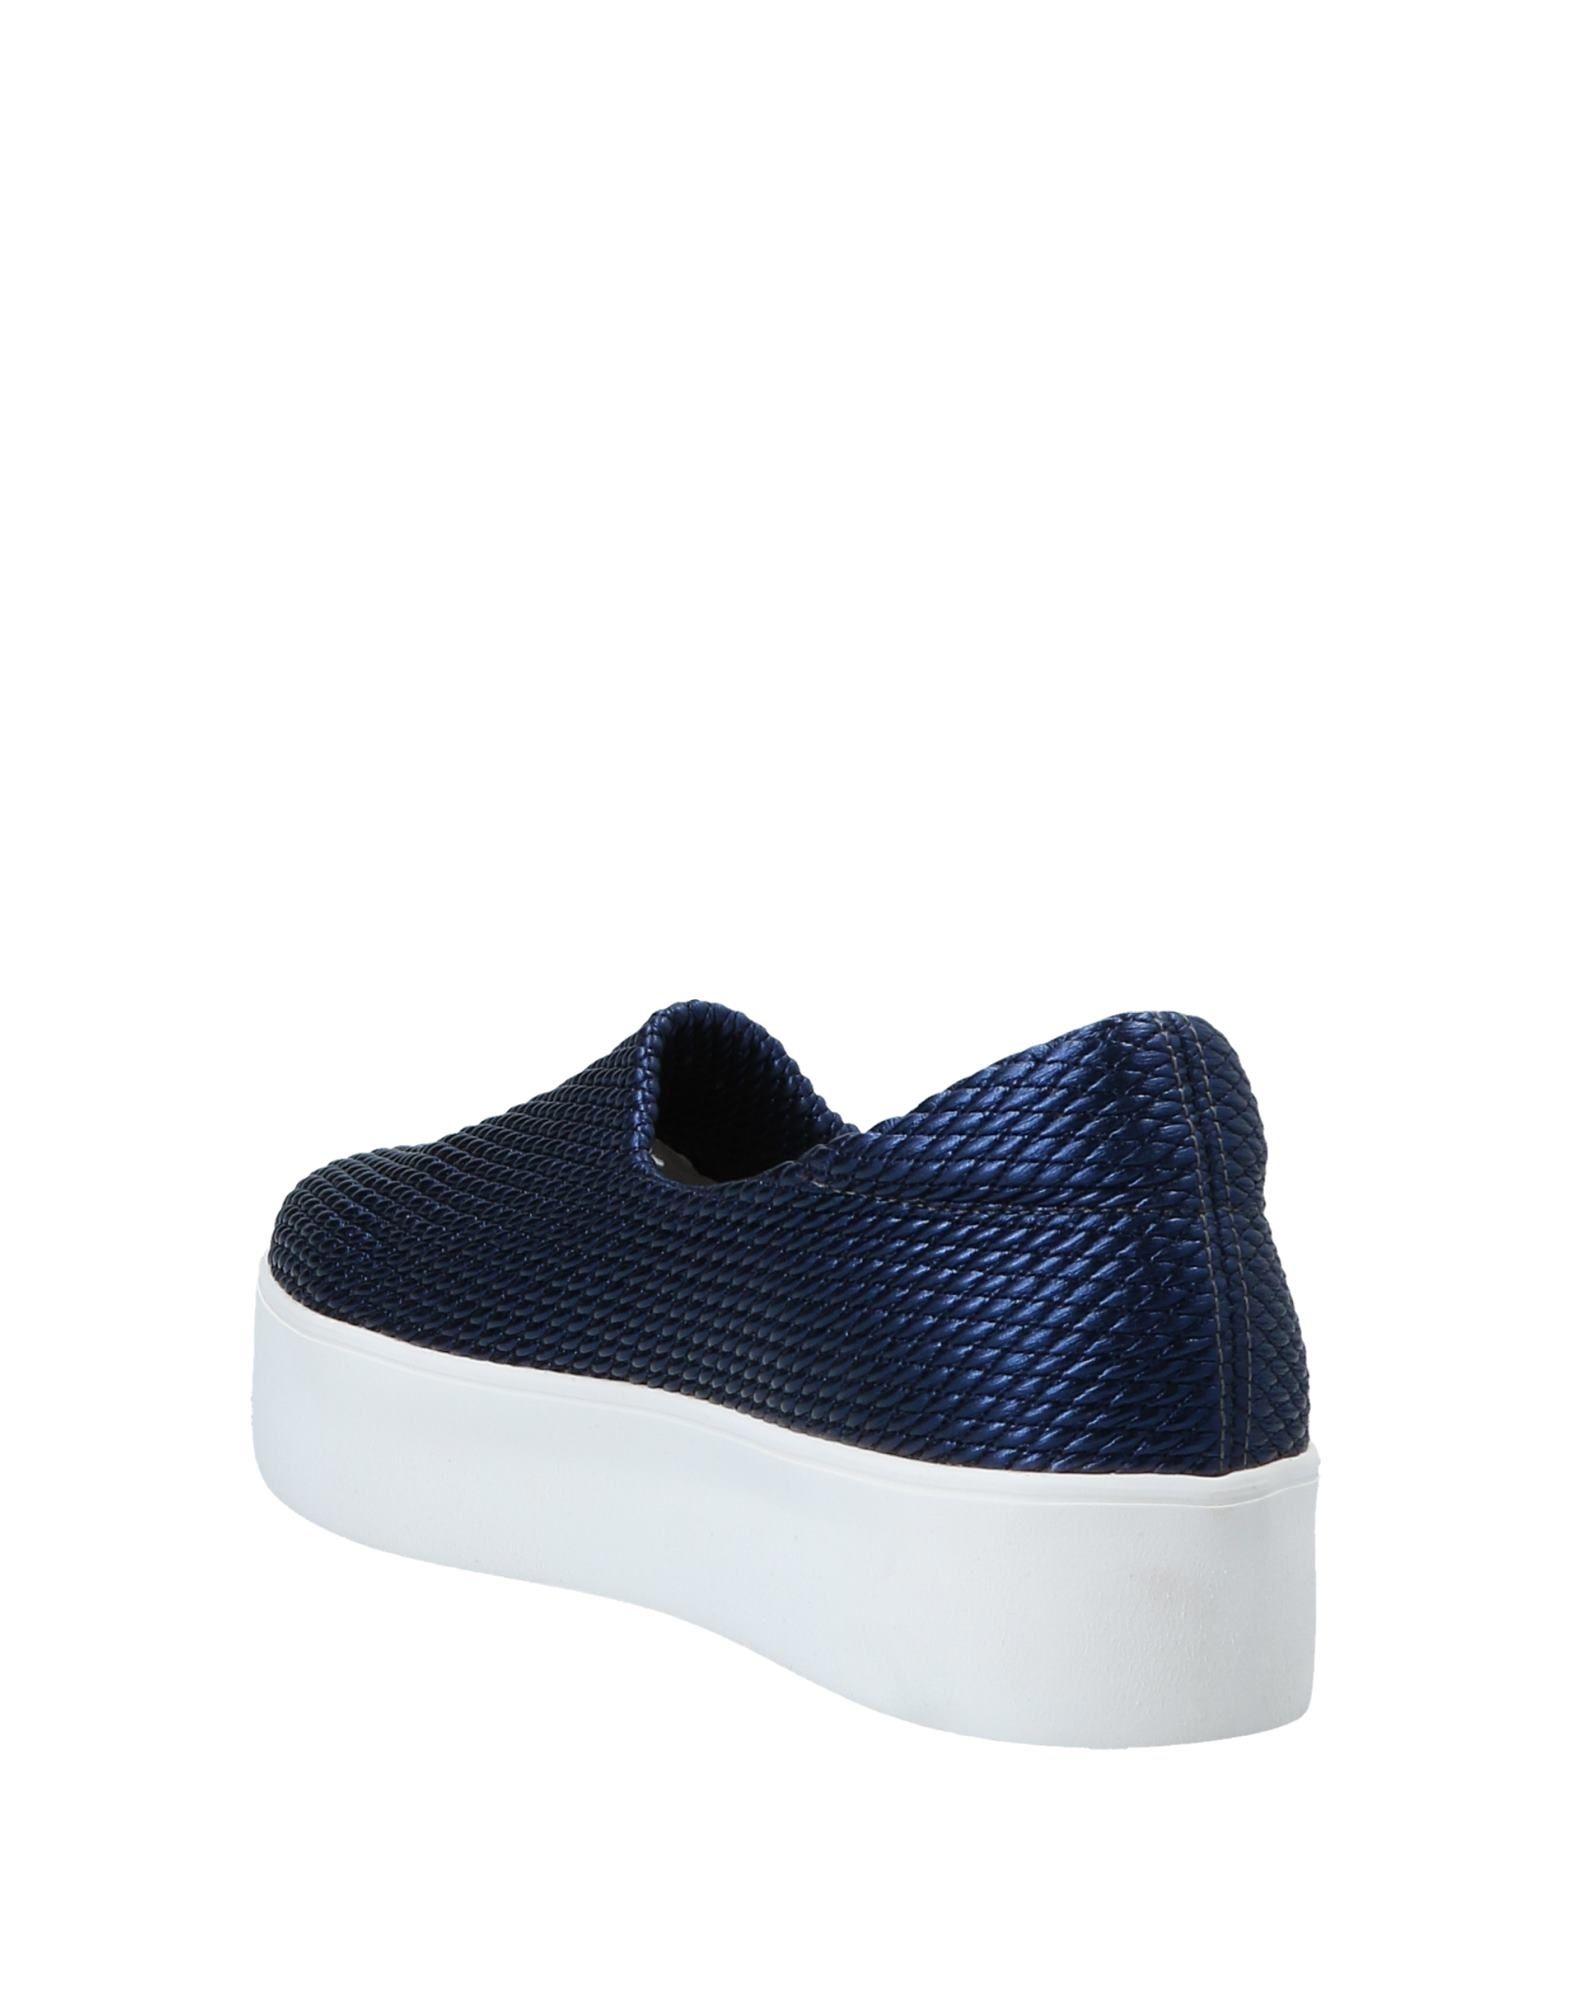 Frau Sneakers Damen   Damen 11435215GW  60cefb